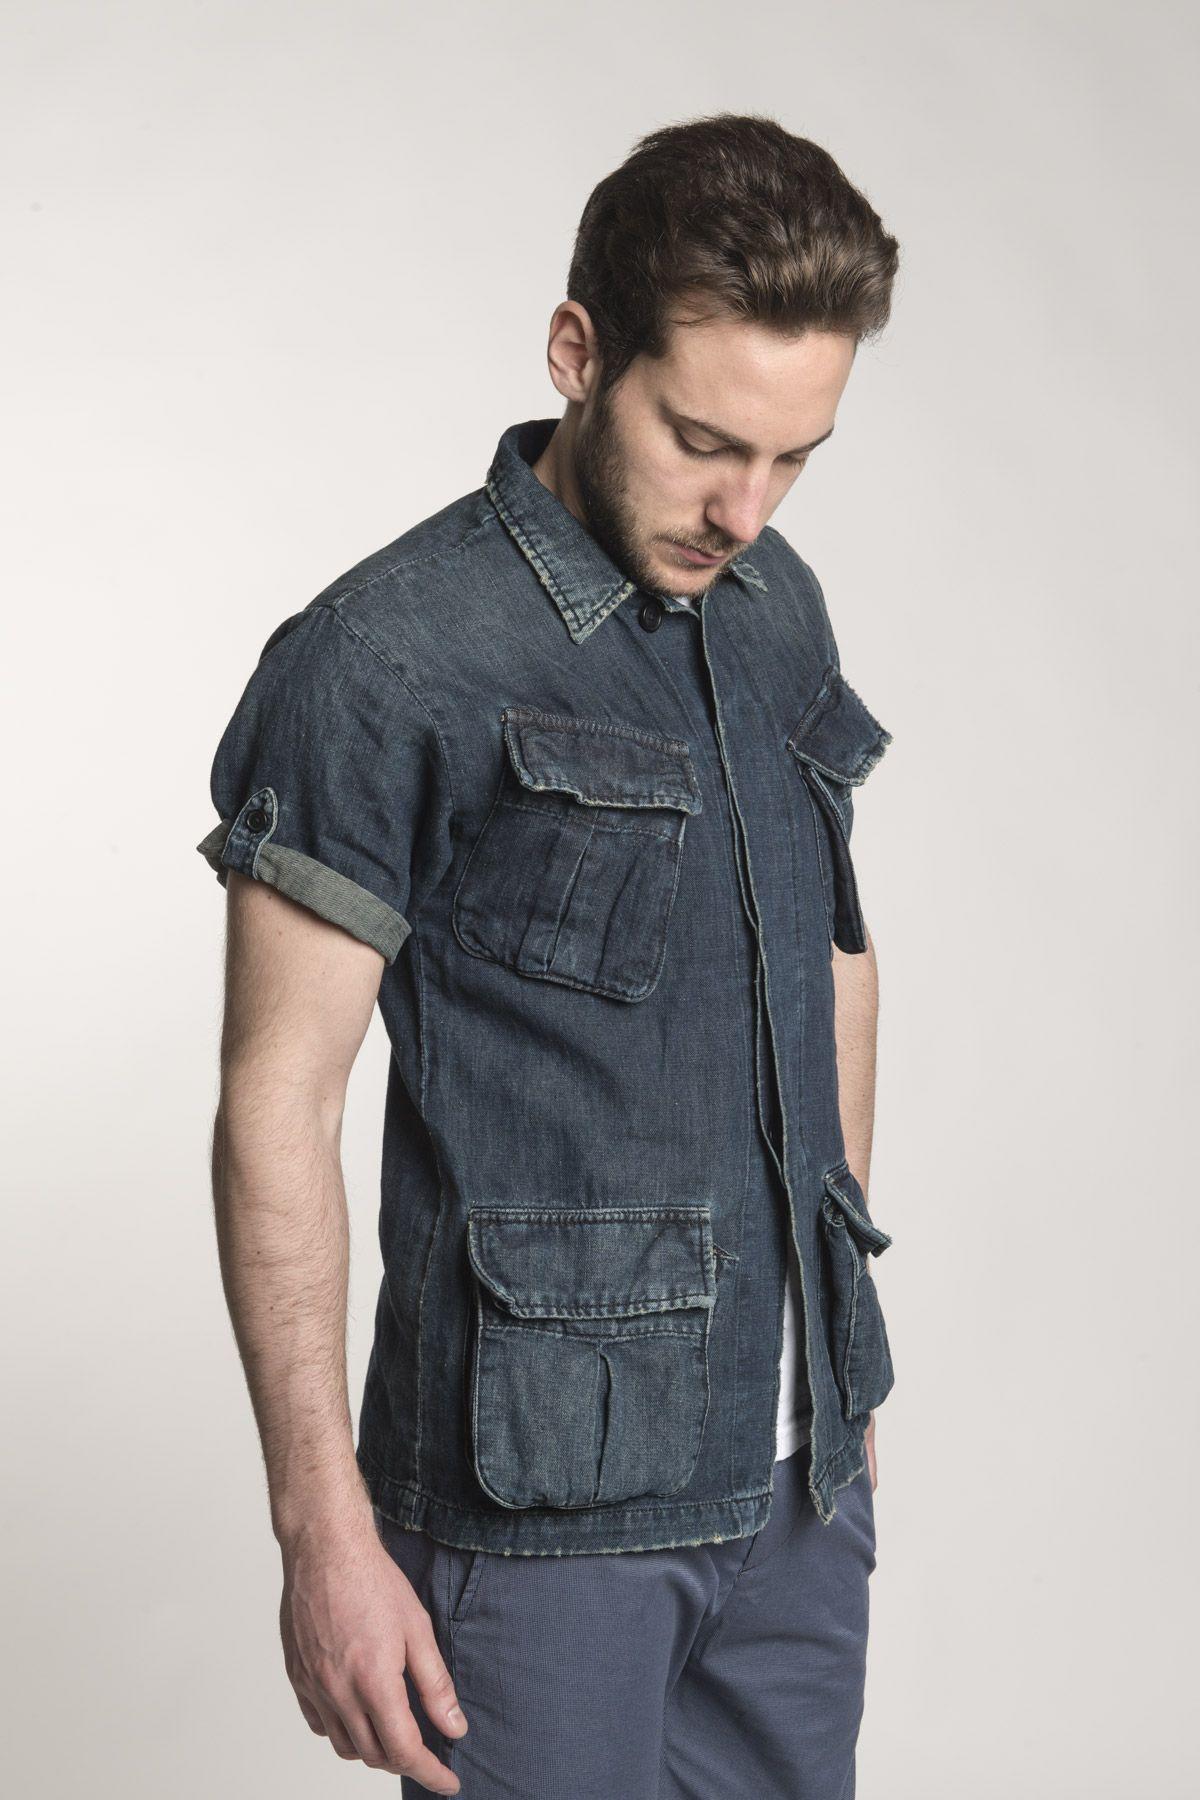 b3486e3eac3 Mens Short Sleeve Black Denim Shirt - BCD Tofu House